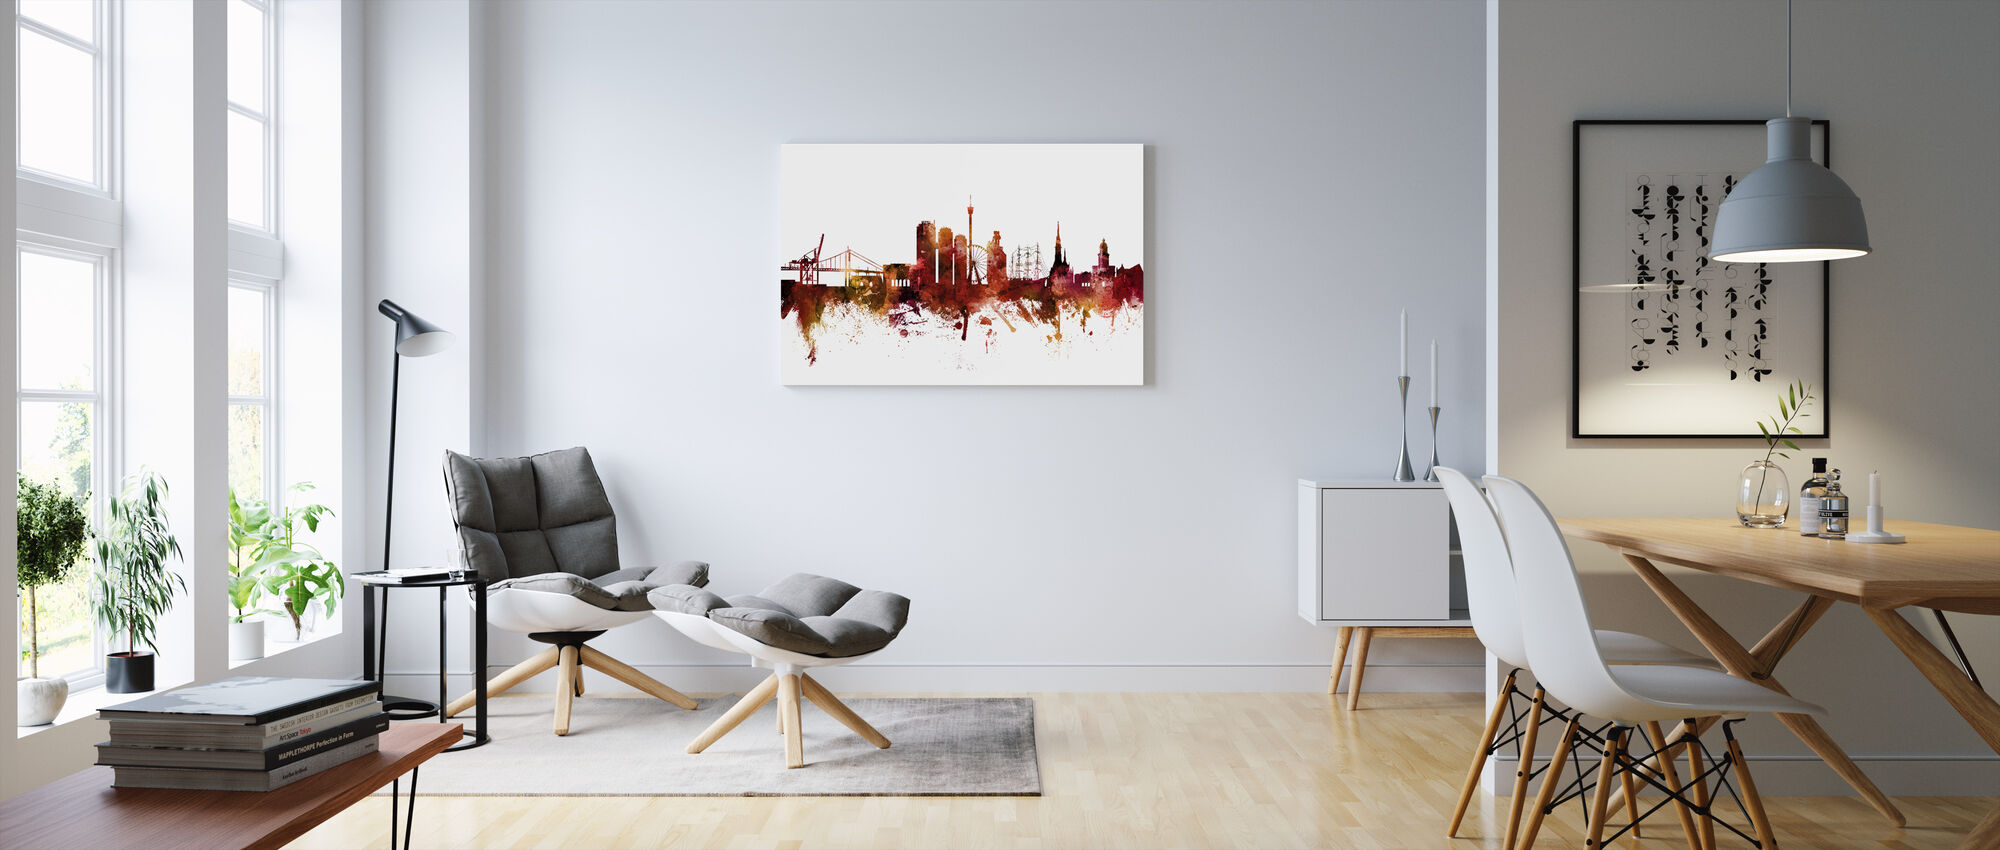 Göteborgs Skyline - Canvastavla - Vardagsrum